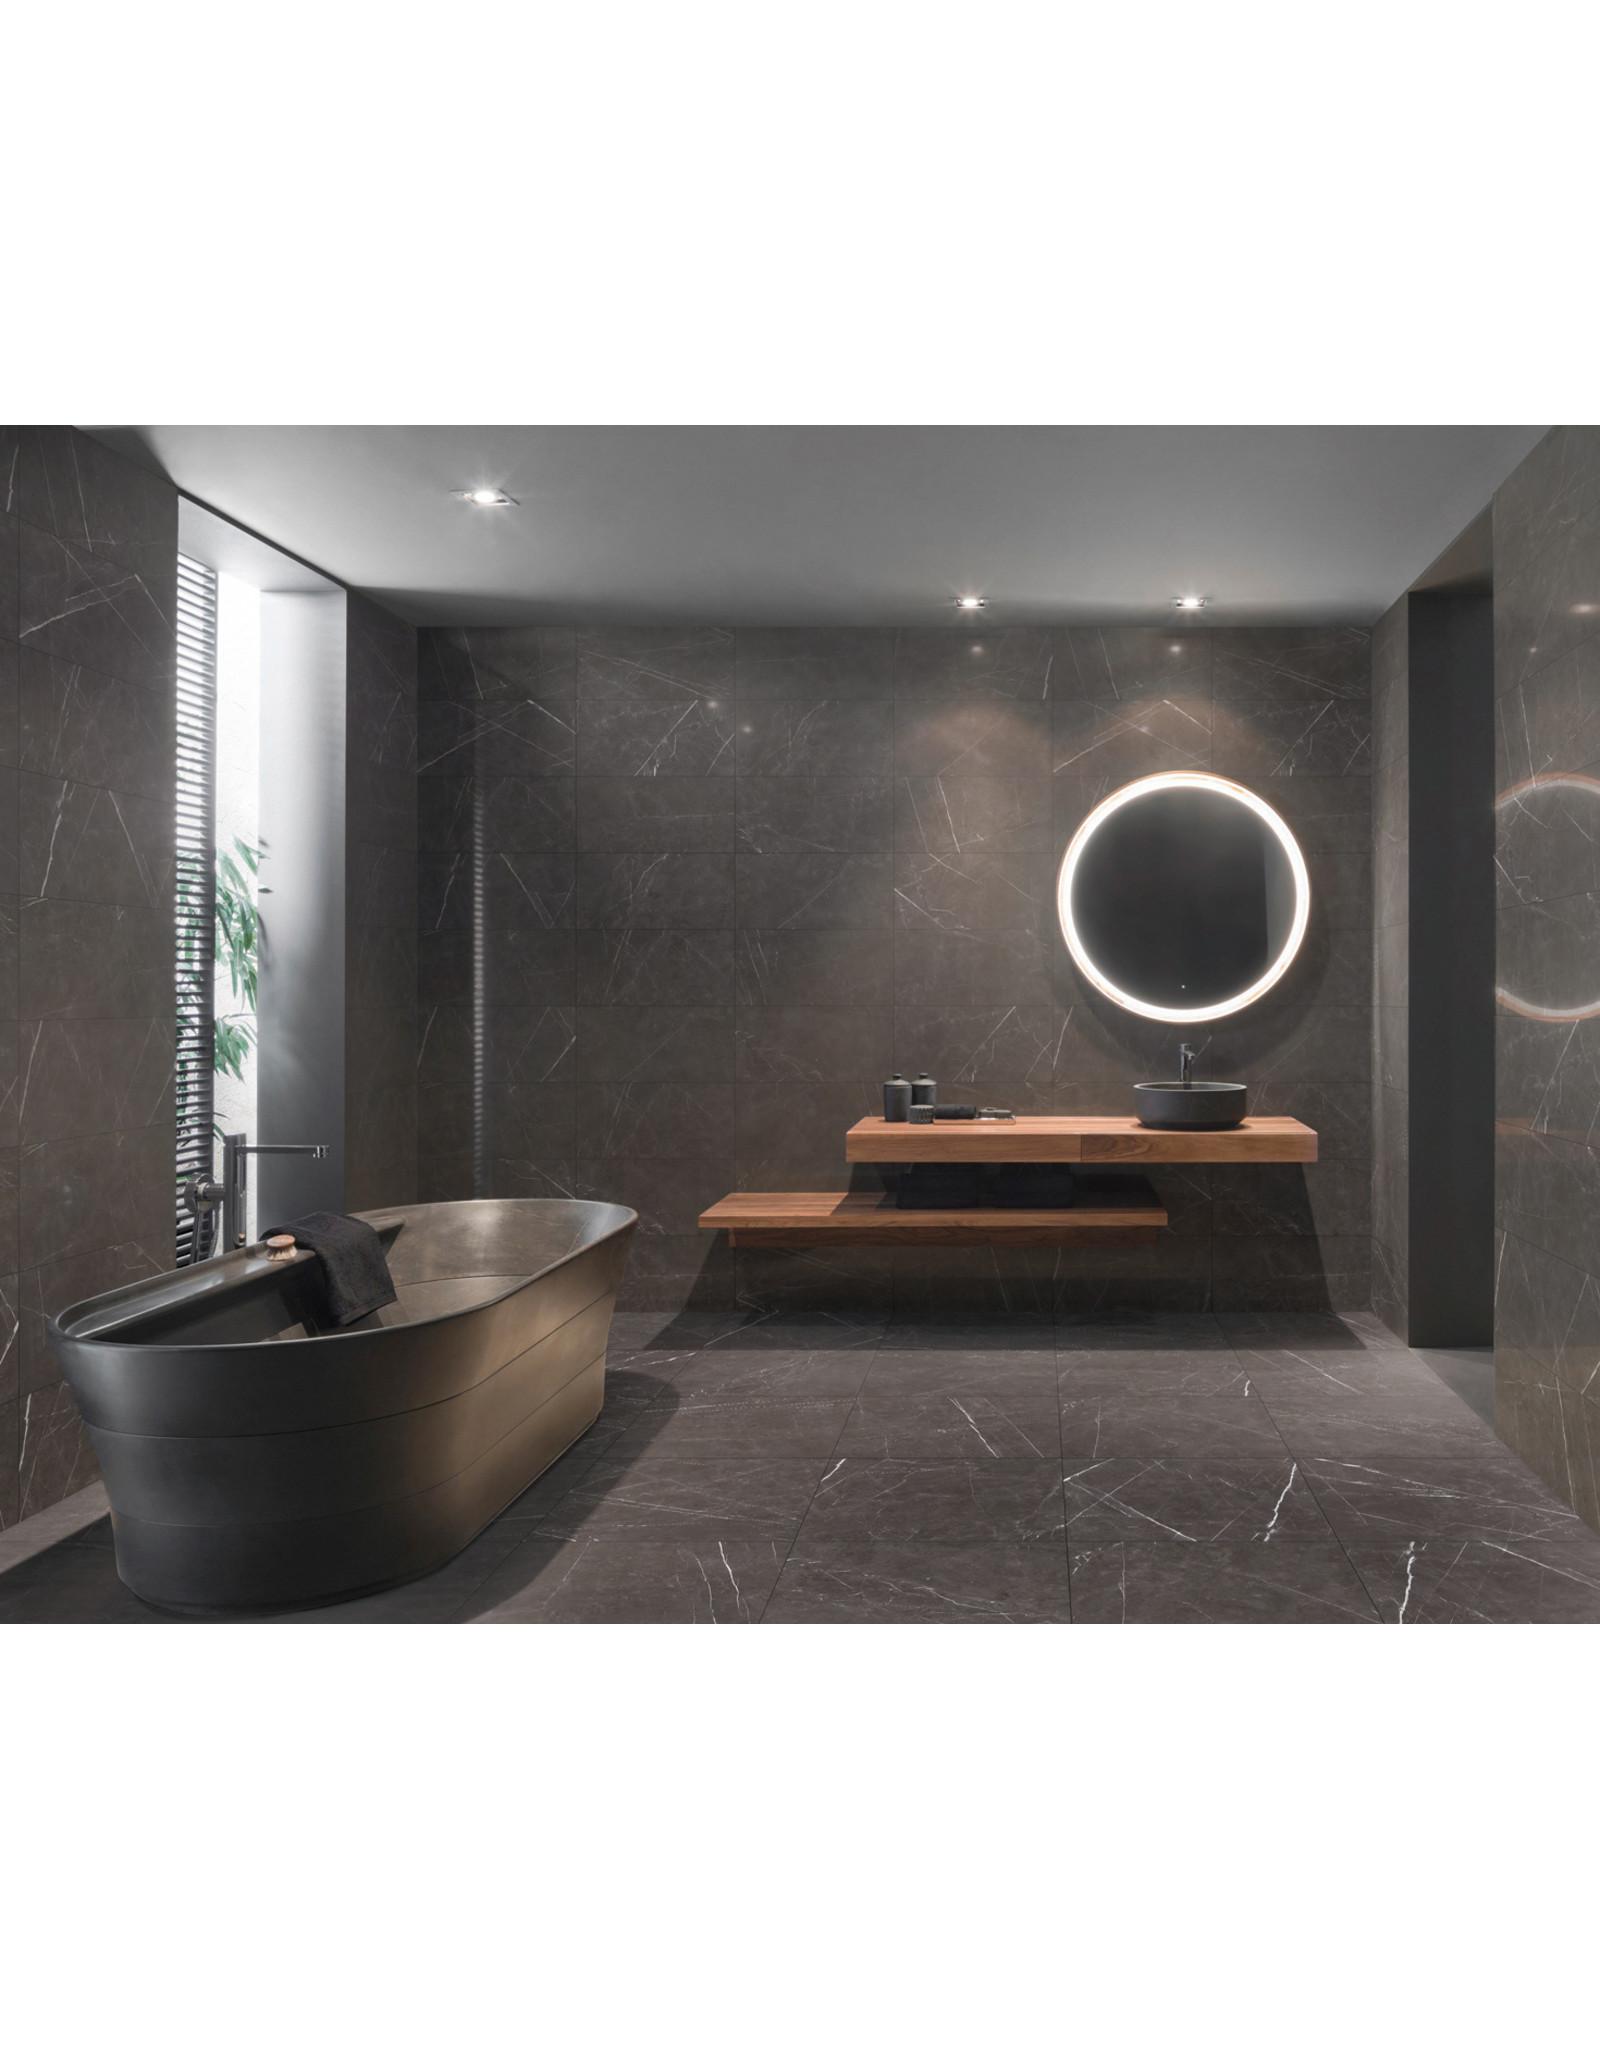 Eternity Tiles 300x600 Lava Etna Matt, Floor & Wall Tile, Price Per Piece